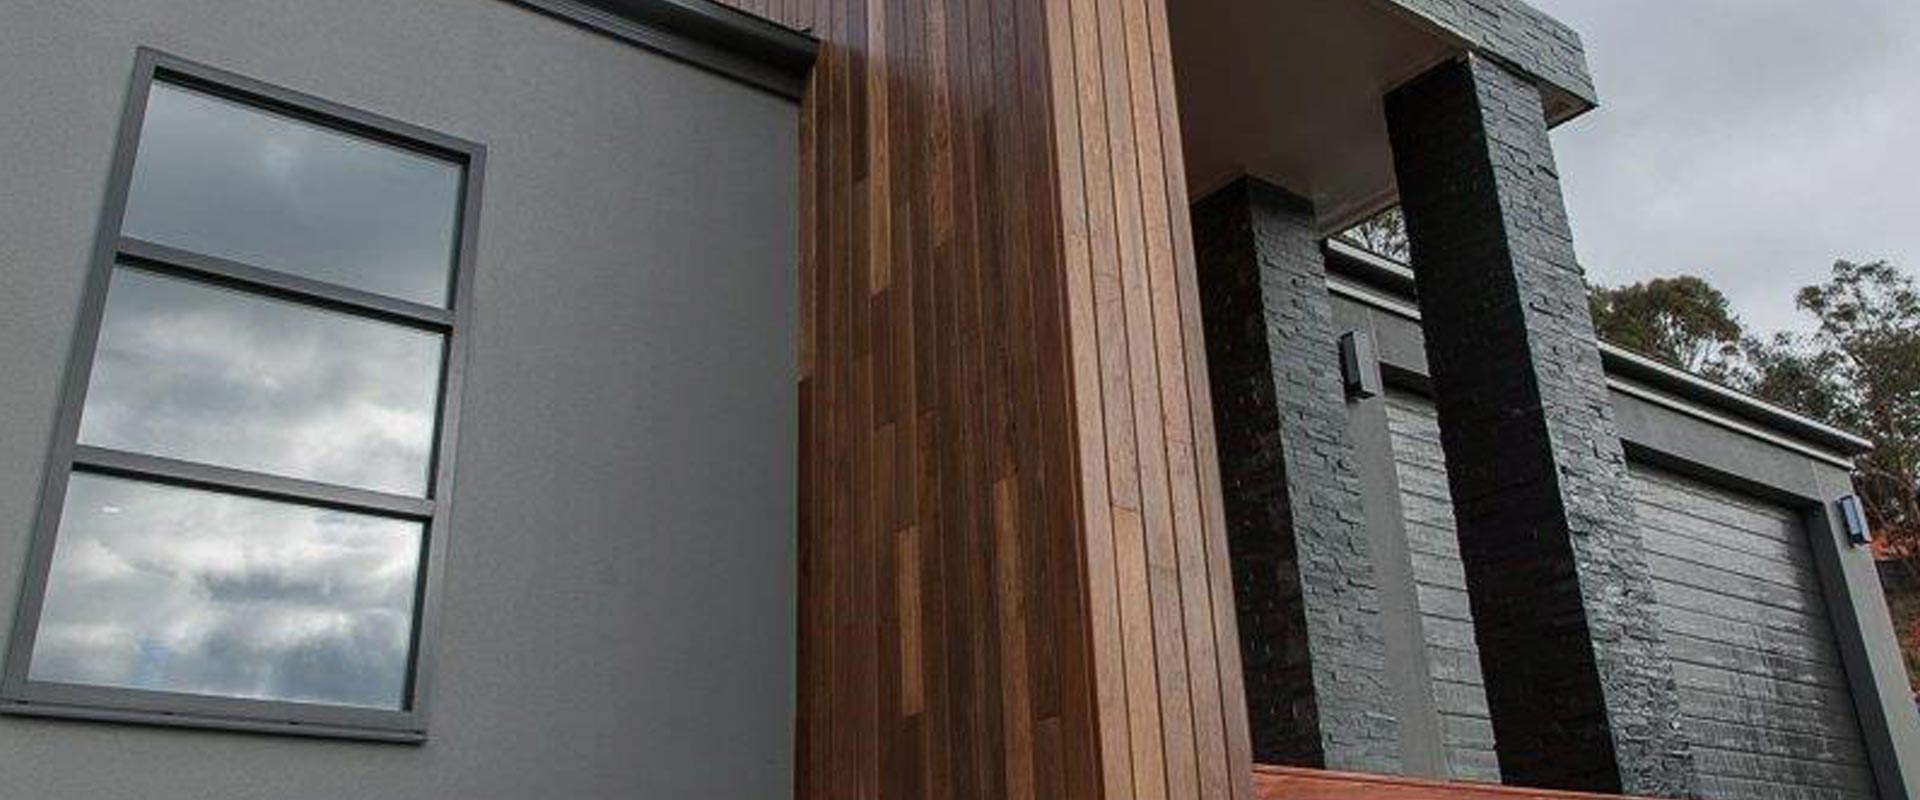 rescomwa magnesium wall linnings